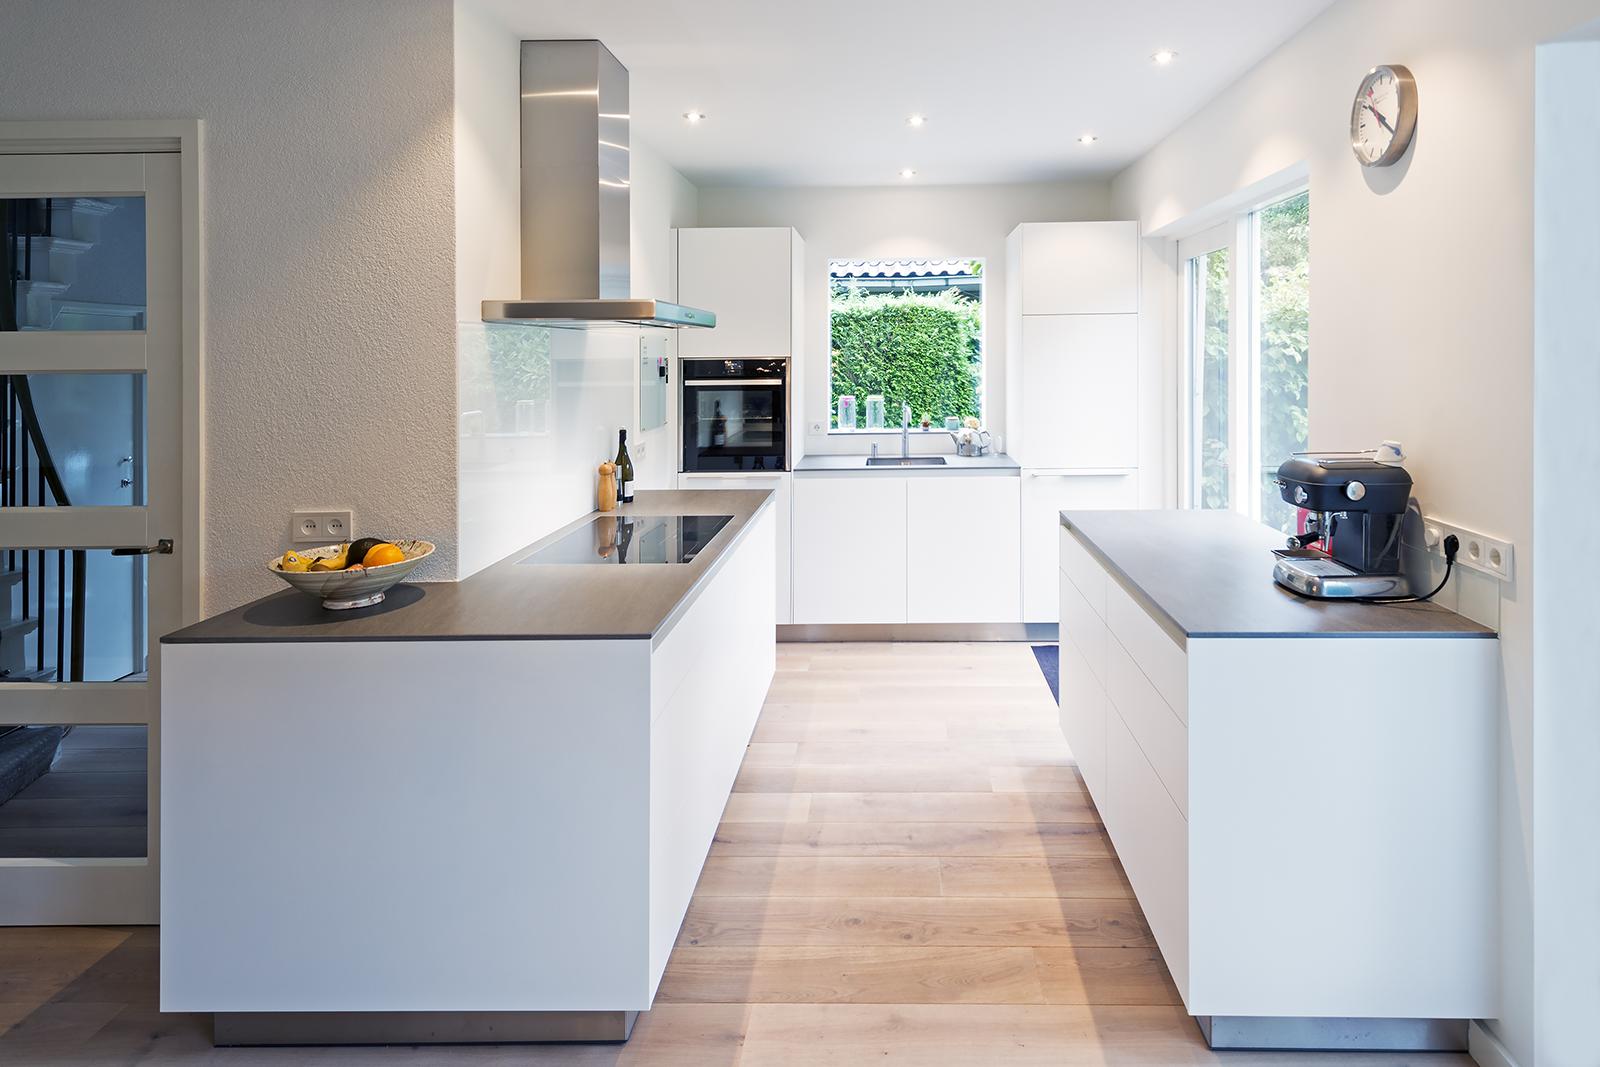 Bulthaup B3 Keuken : Bulthaup keukens stadshaege keukendesign loods keukens keuken